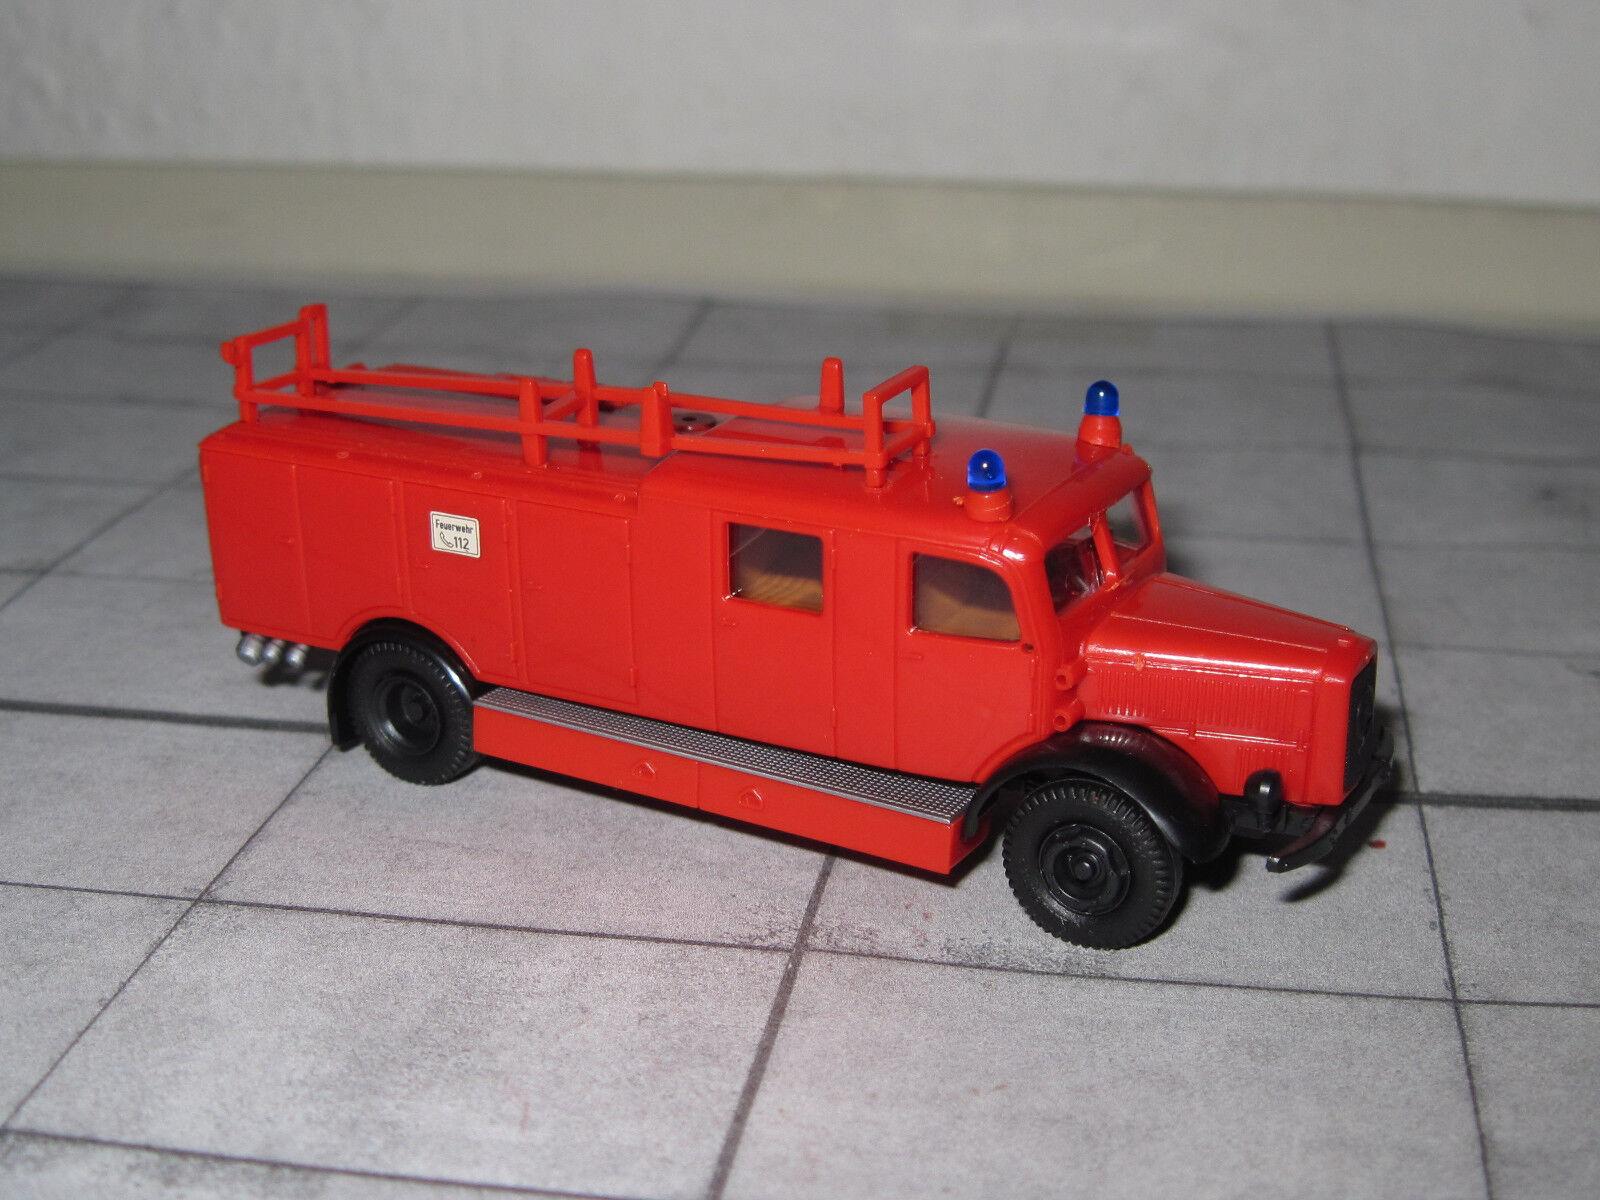 Herpa 743112-Mercedes Benz-lf 25-Roco minitanks nº 1685 1685 1685 b09cdc